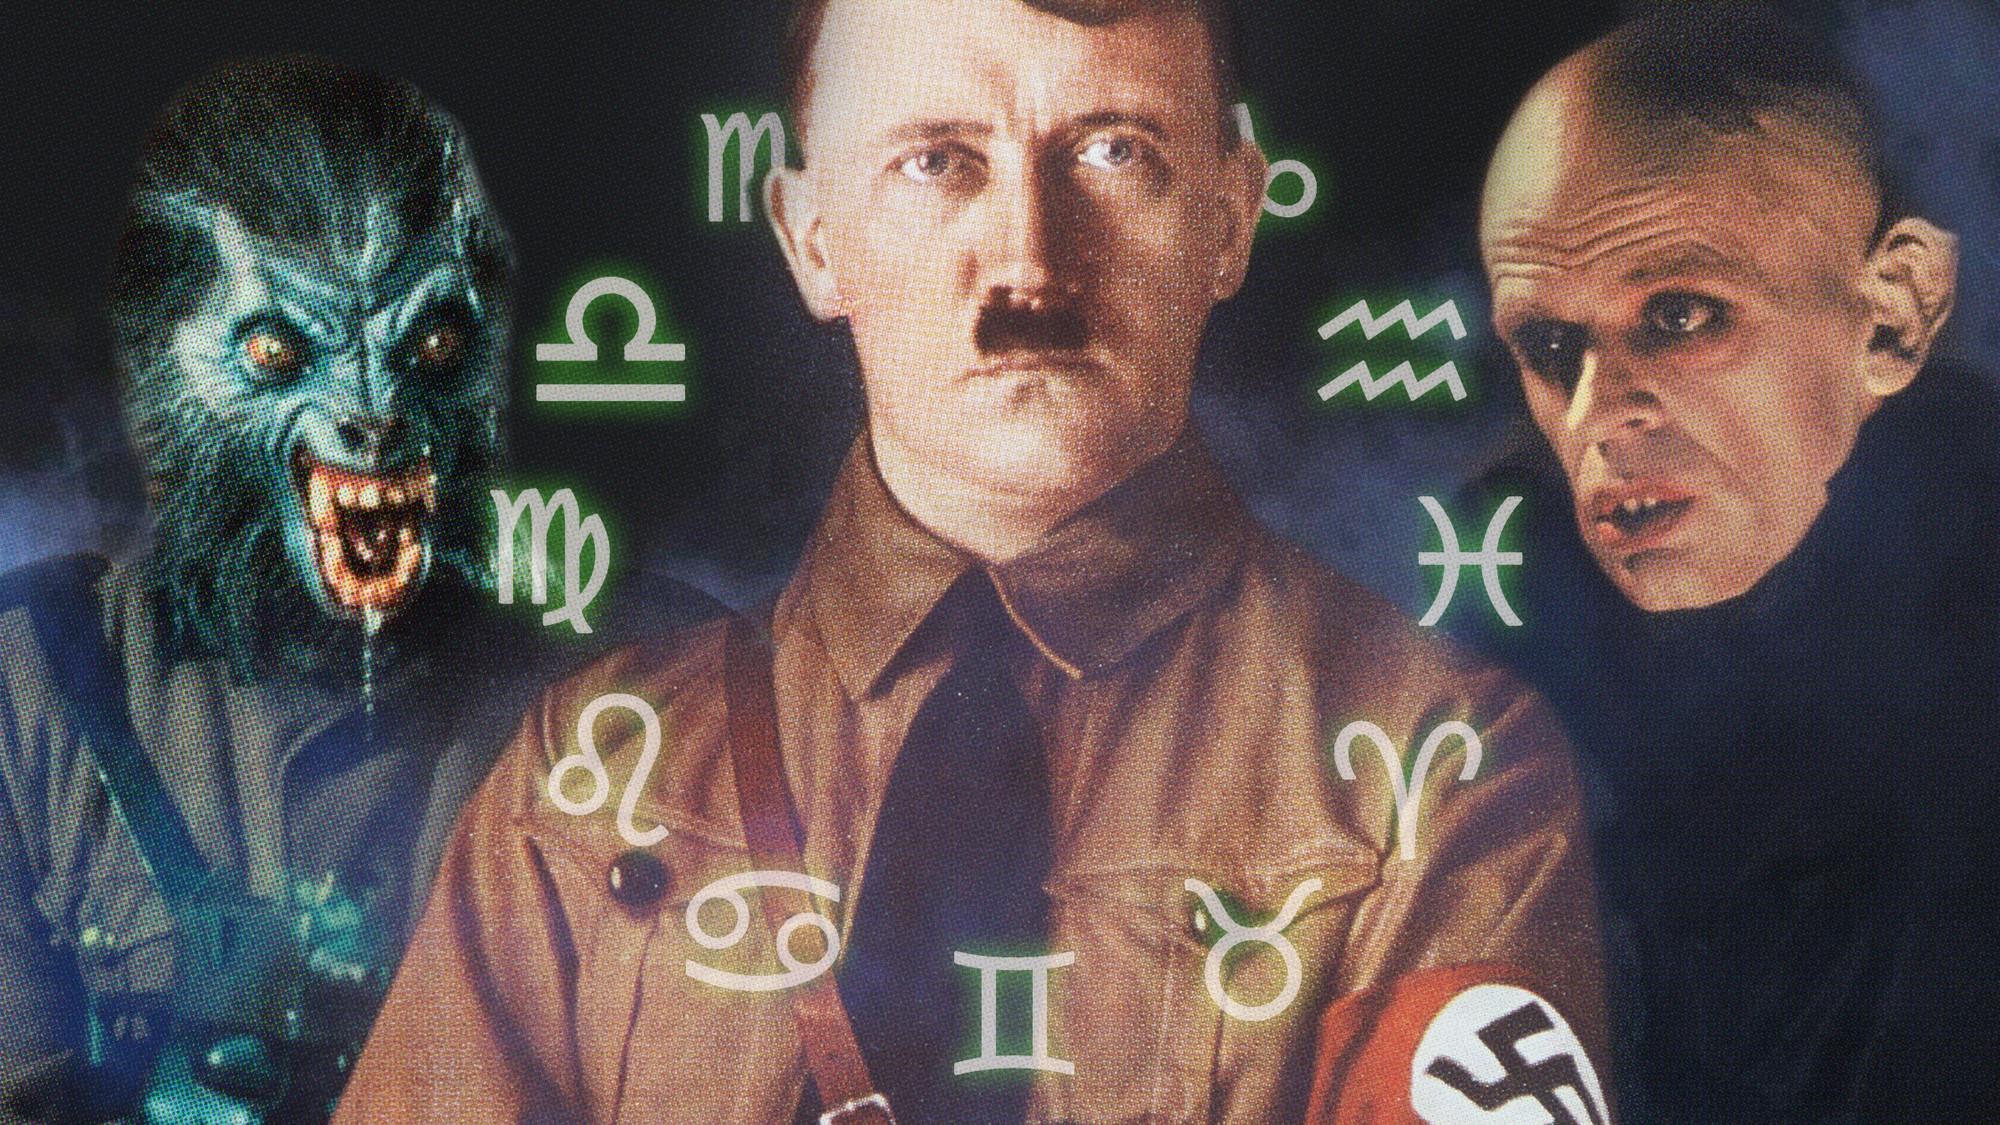 Hitler Used Werewolves, Vampires, and Astrology to Brainwash